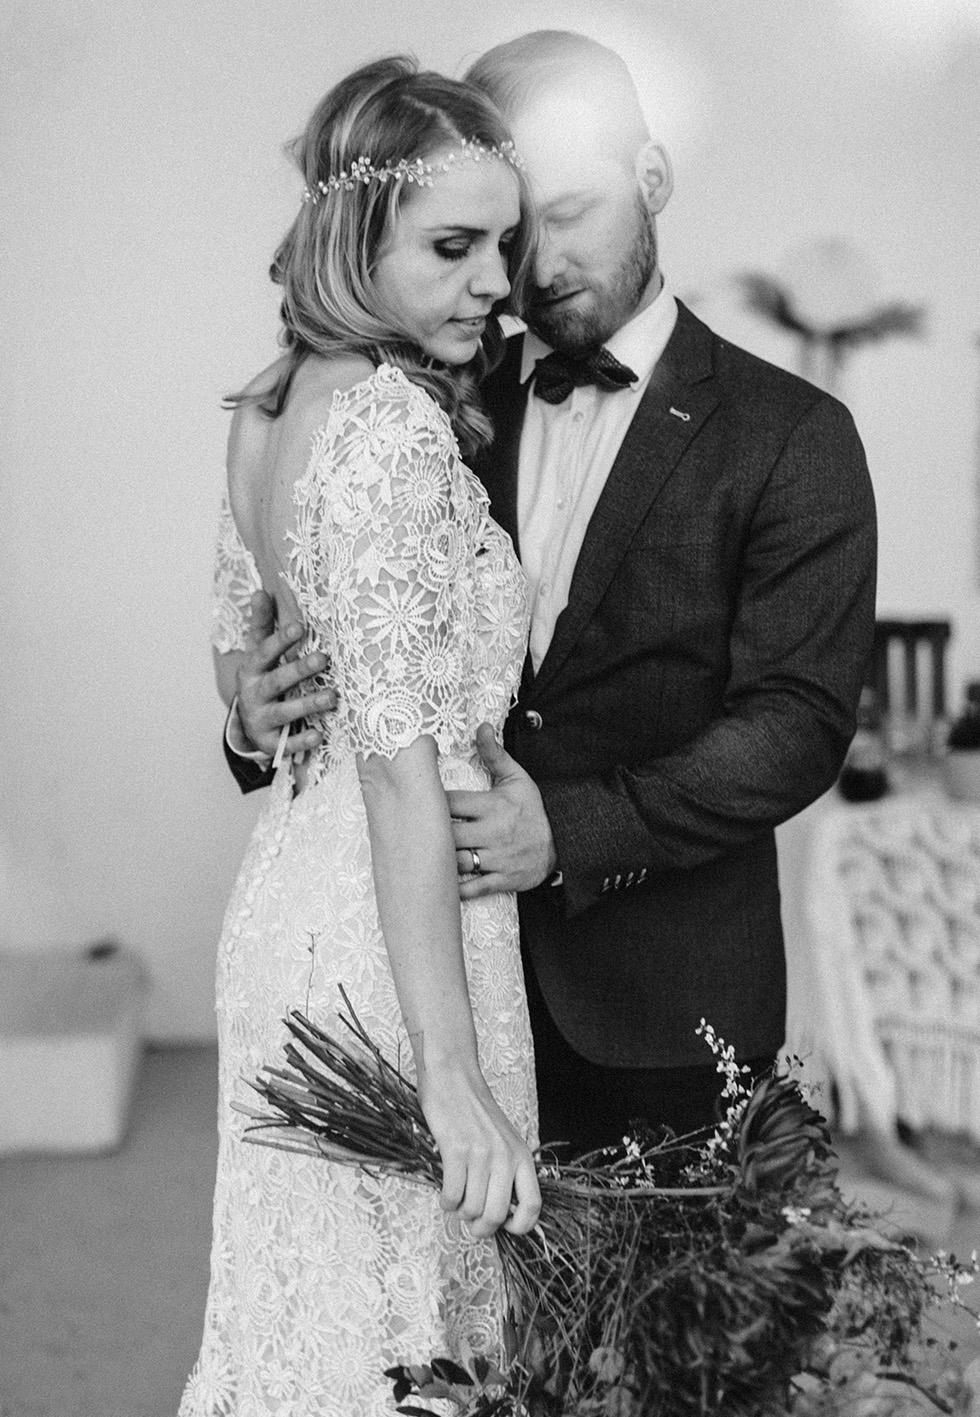 Traumanufaktur_Schloss_Diersford_Bohemian_Wedding_Boho_Hochzeit_Hochzeitsfotograf_078.jpg